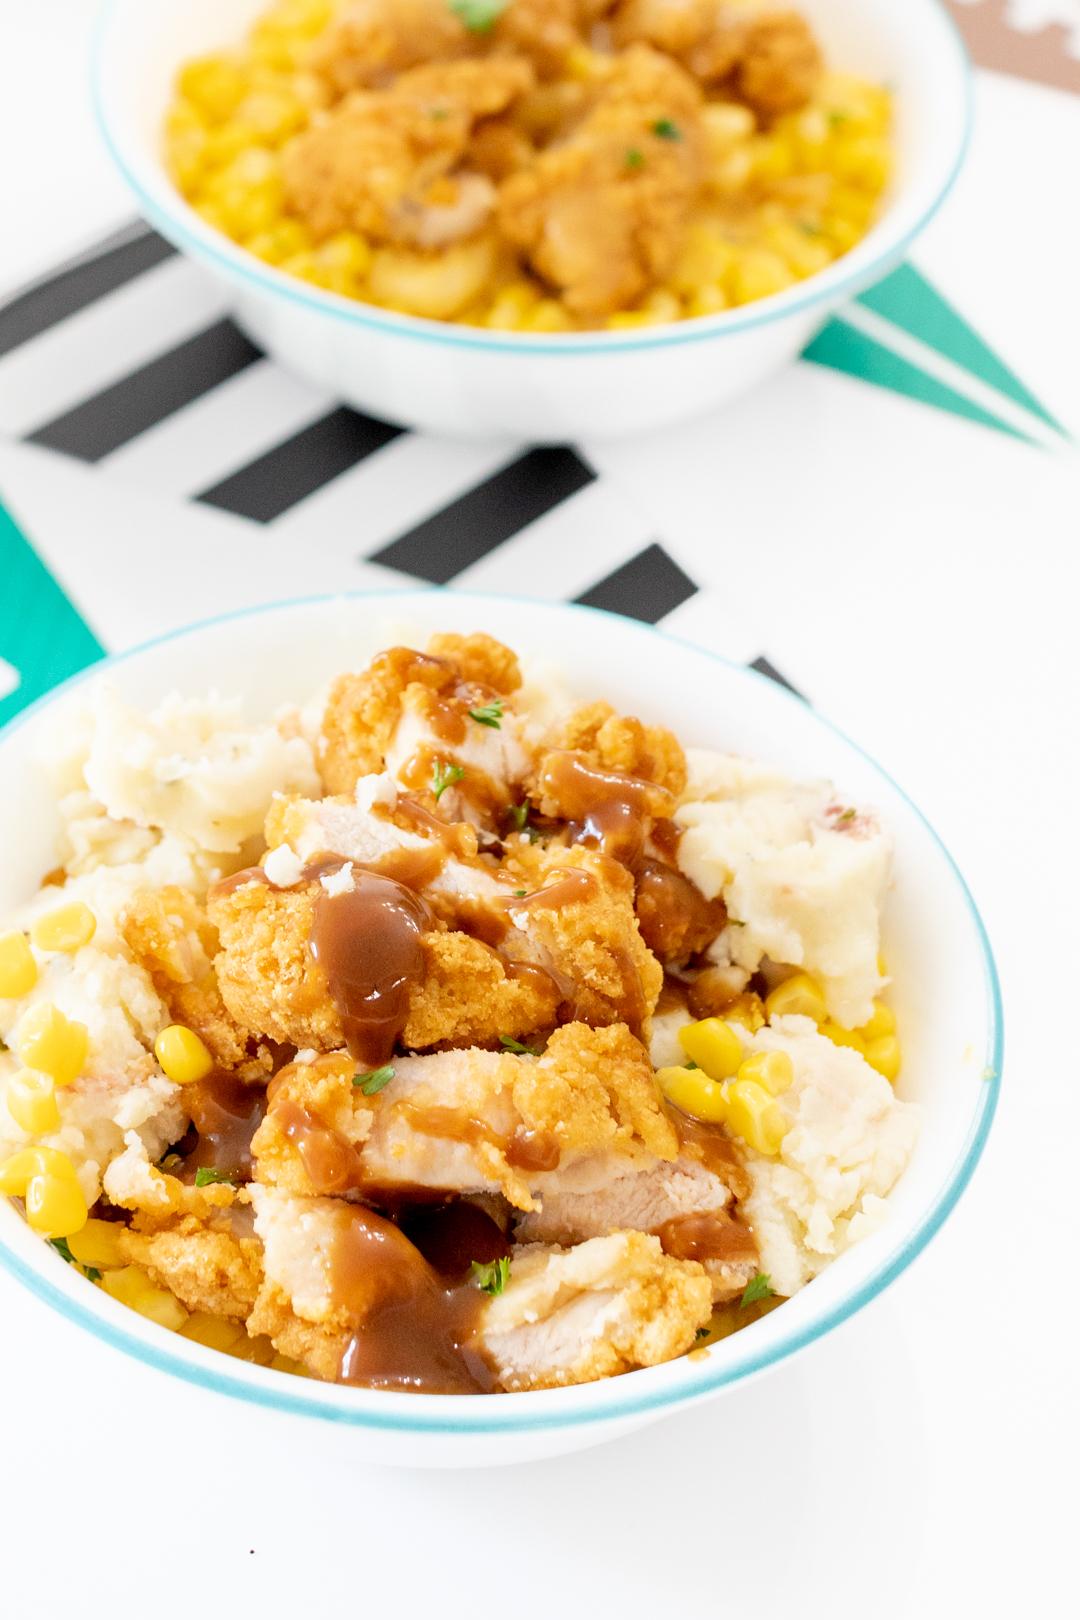 Crispy chicken bowls